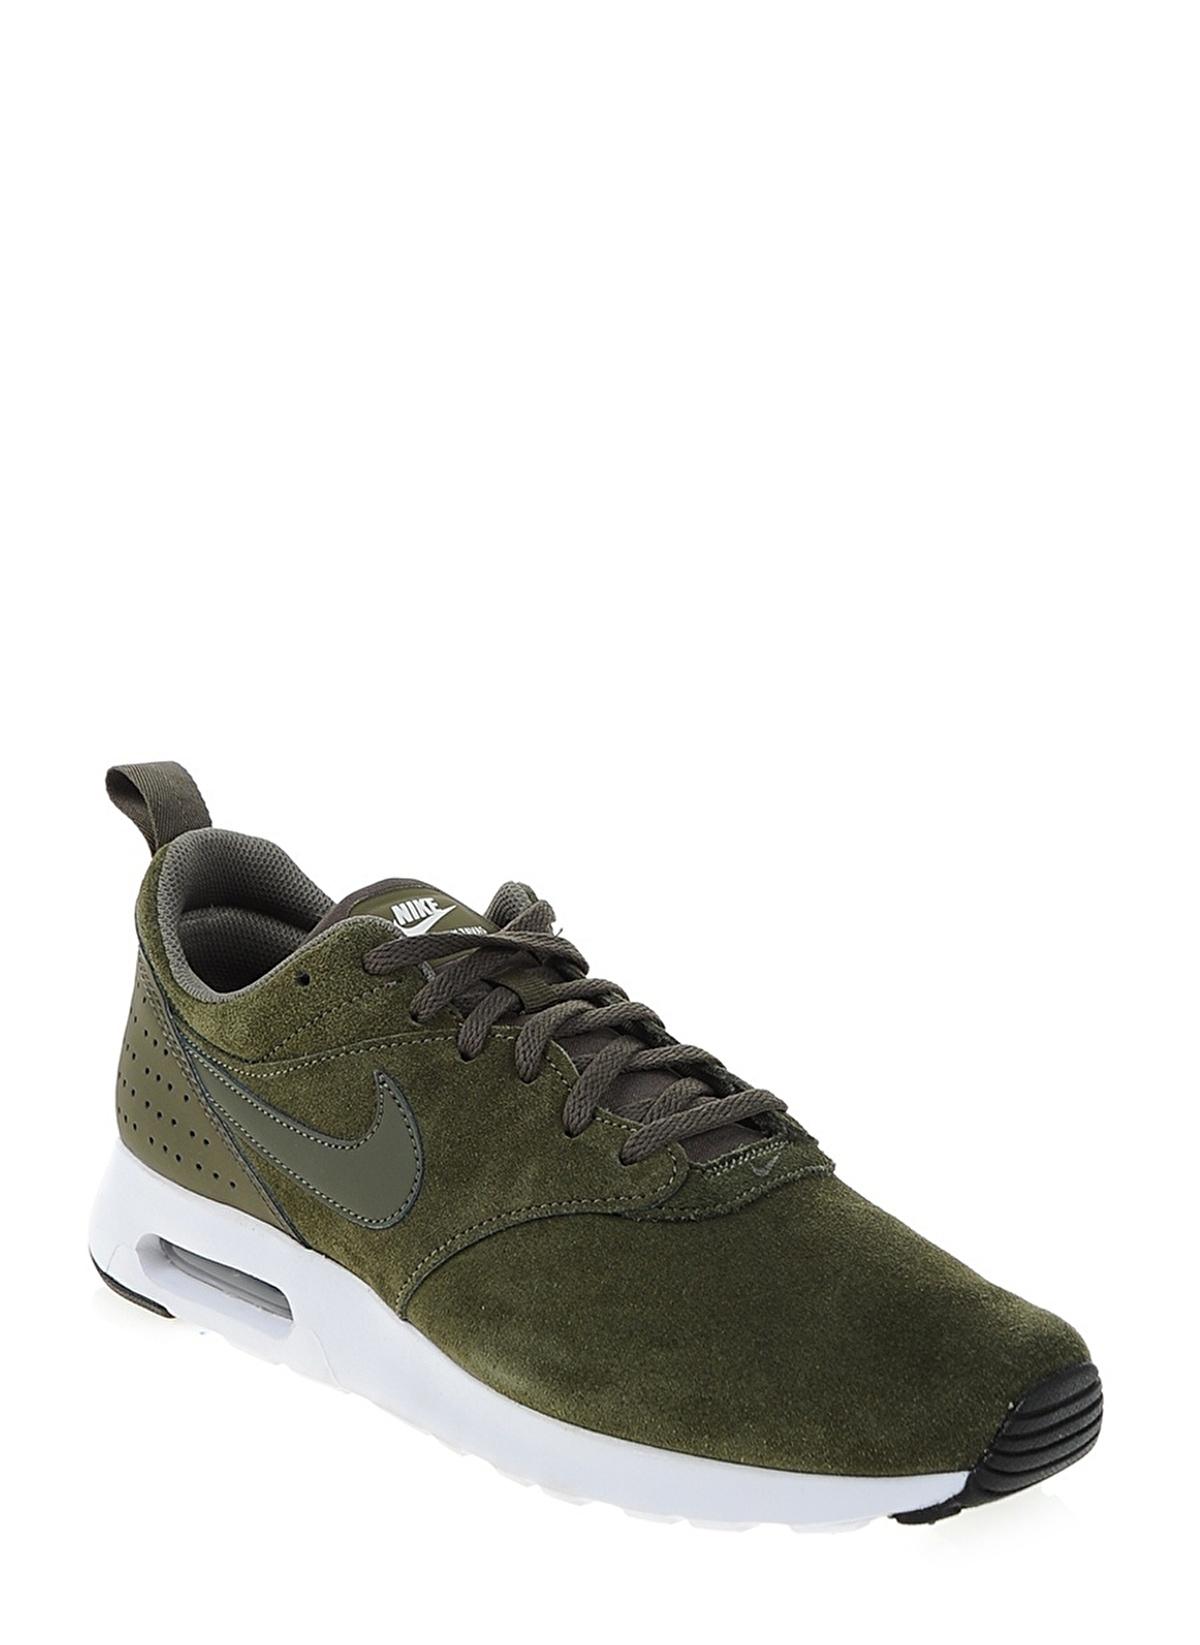 online store 9fce4 1a268 Nike Nike Air Max Tavas Ltr Yeşil ...